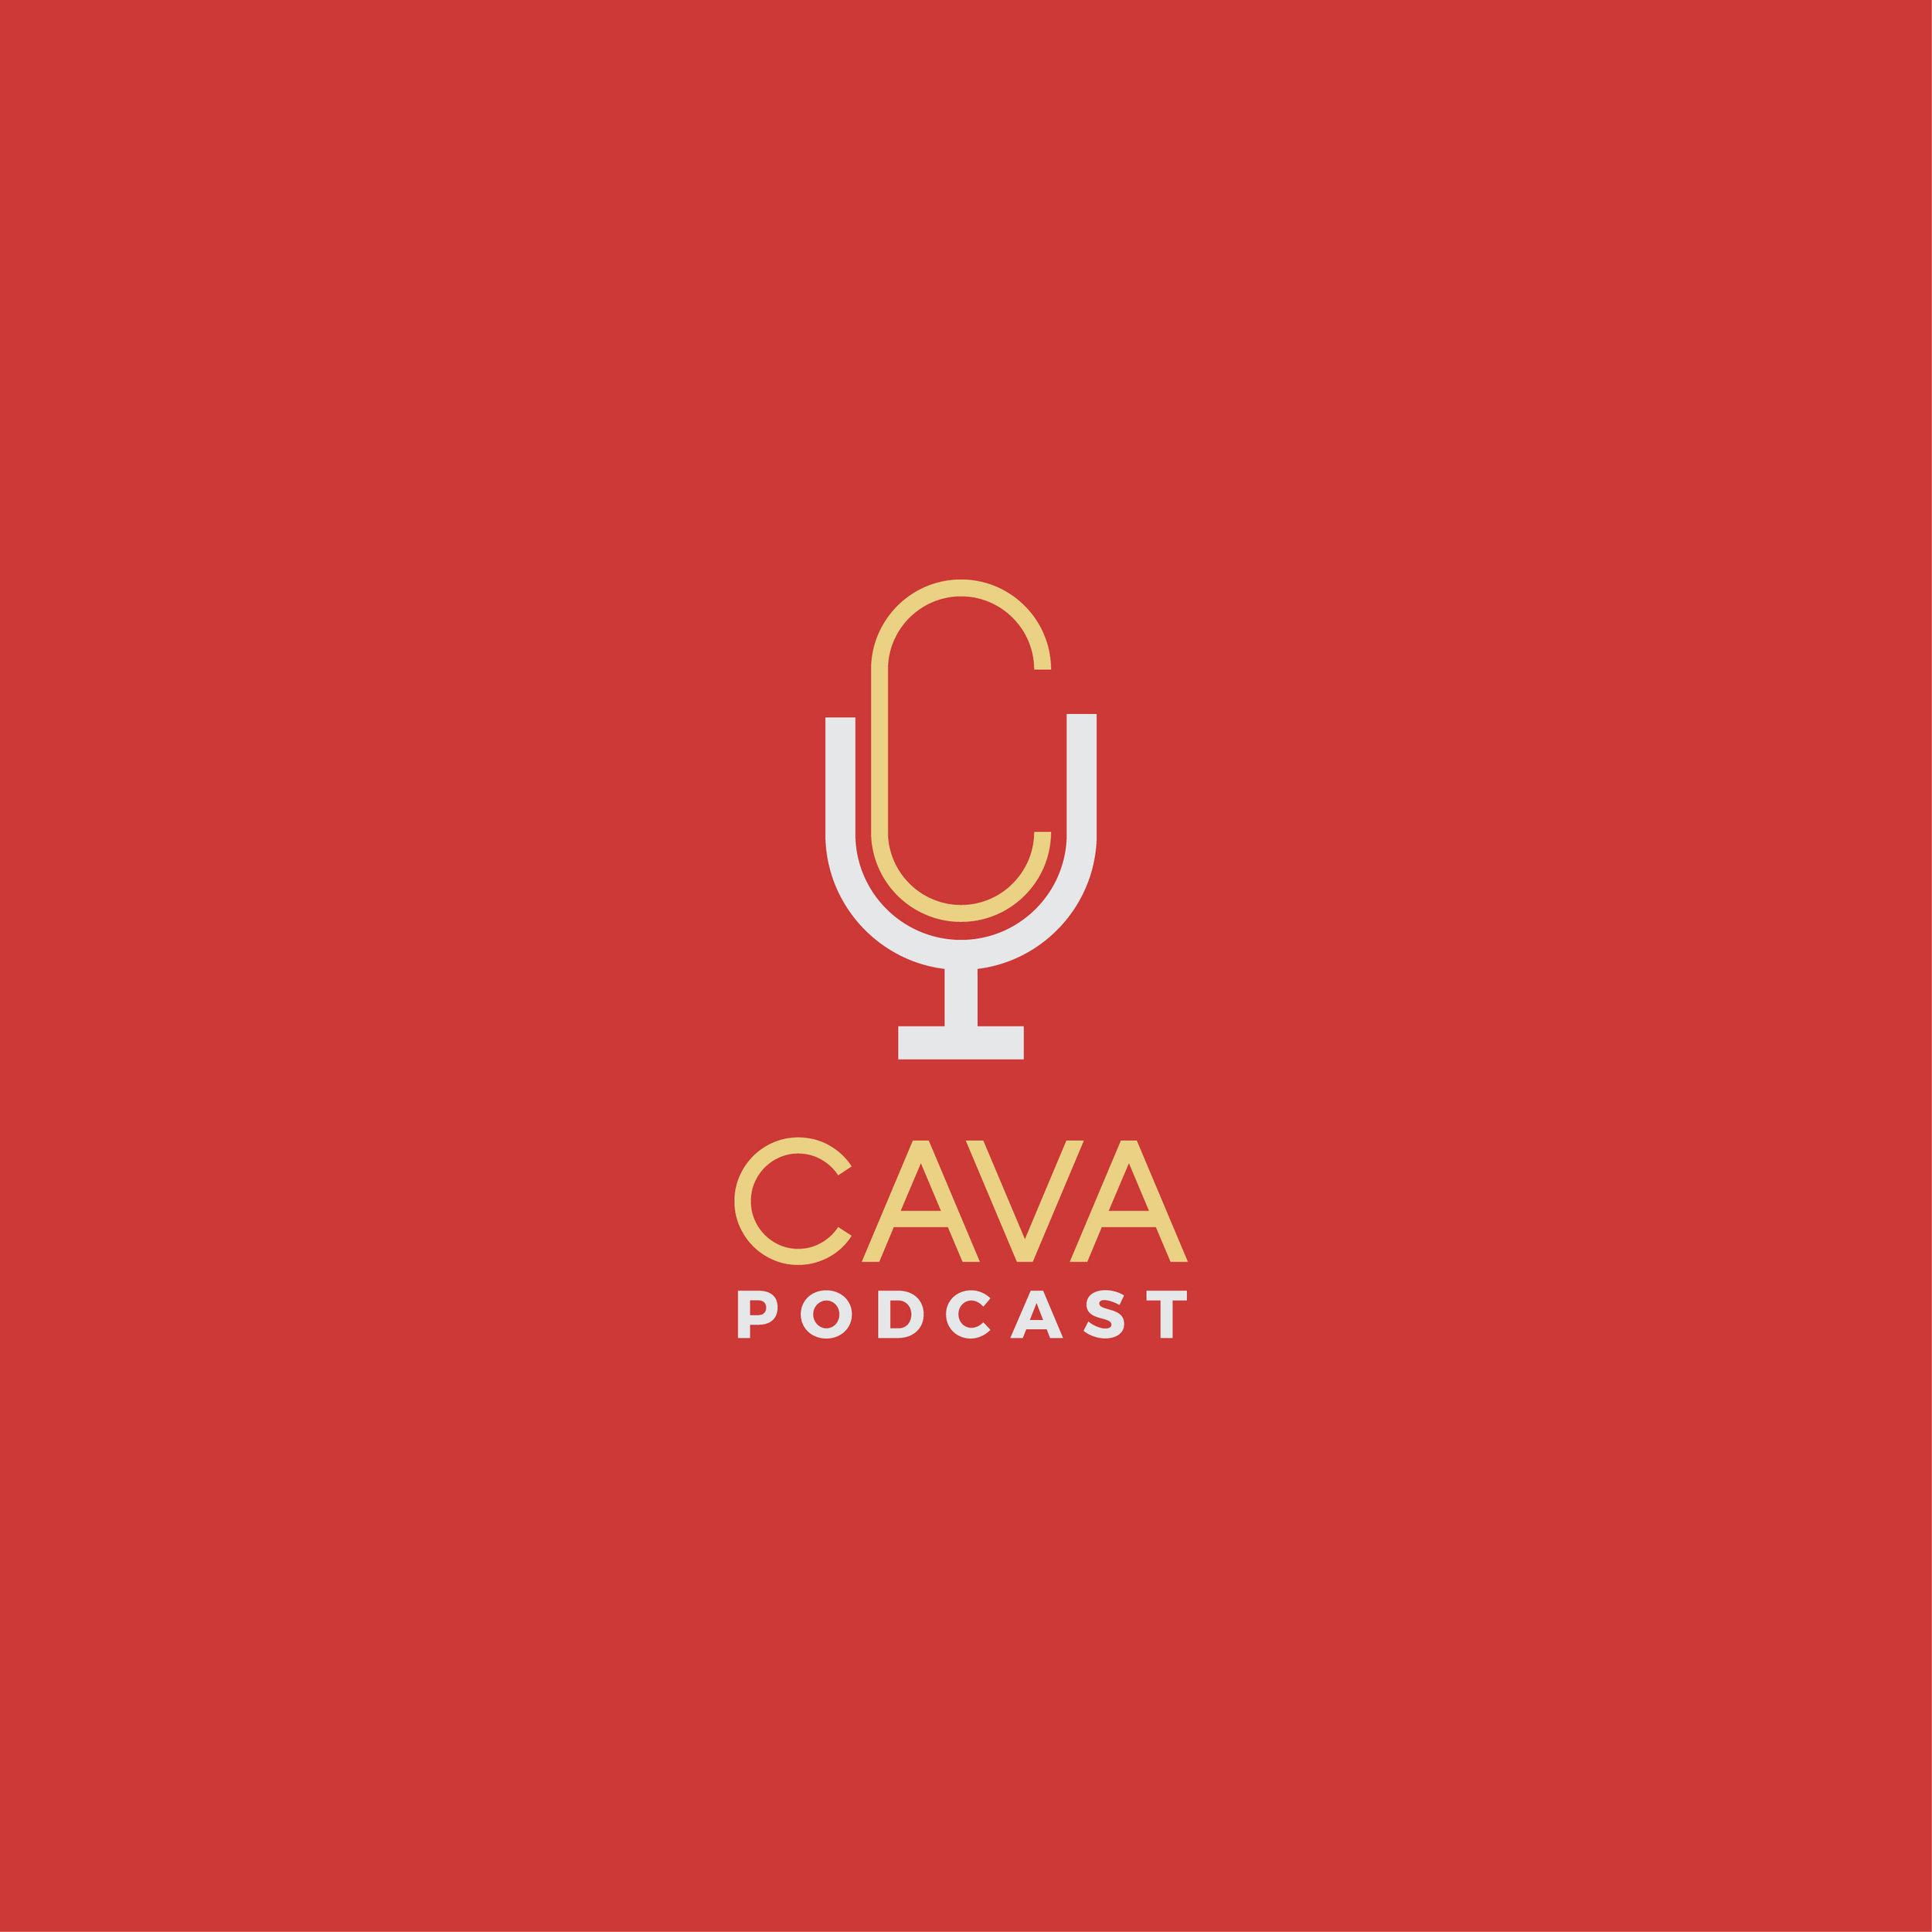 CAVA-1.jpg